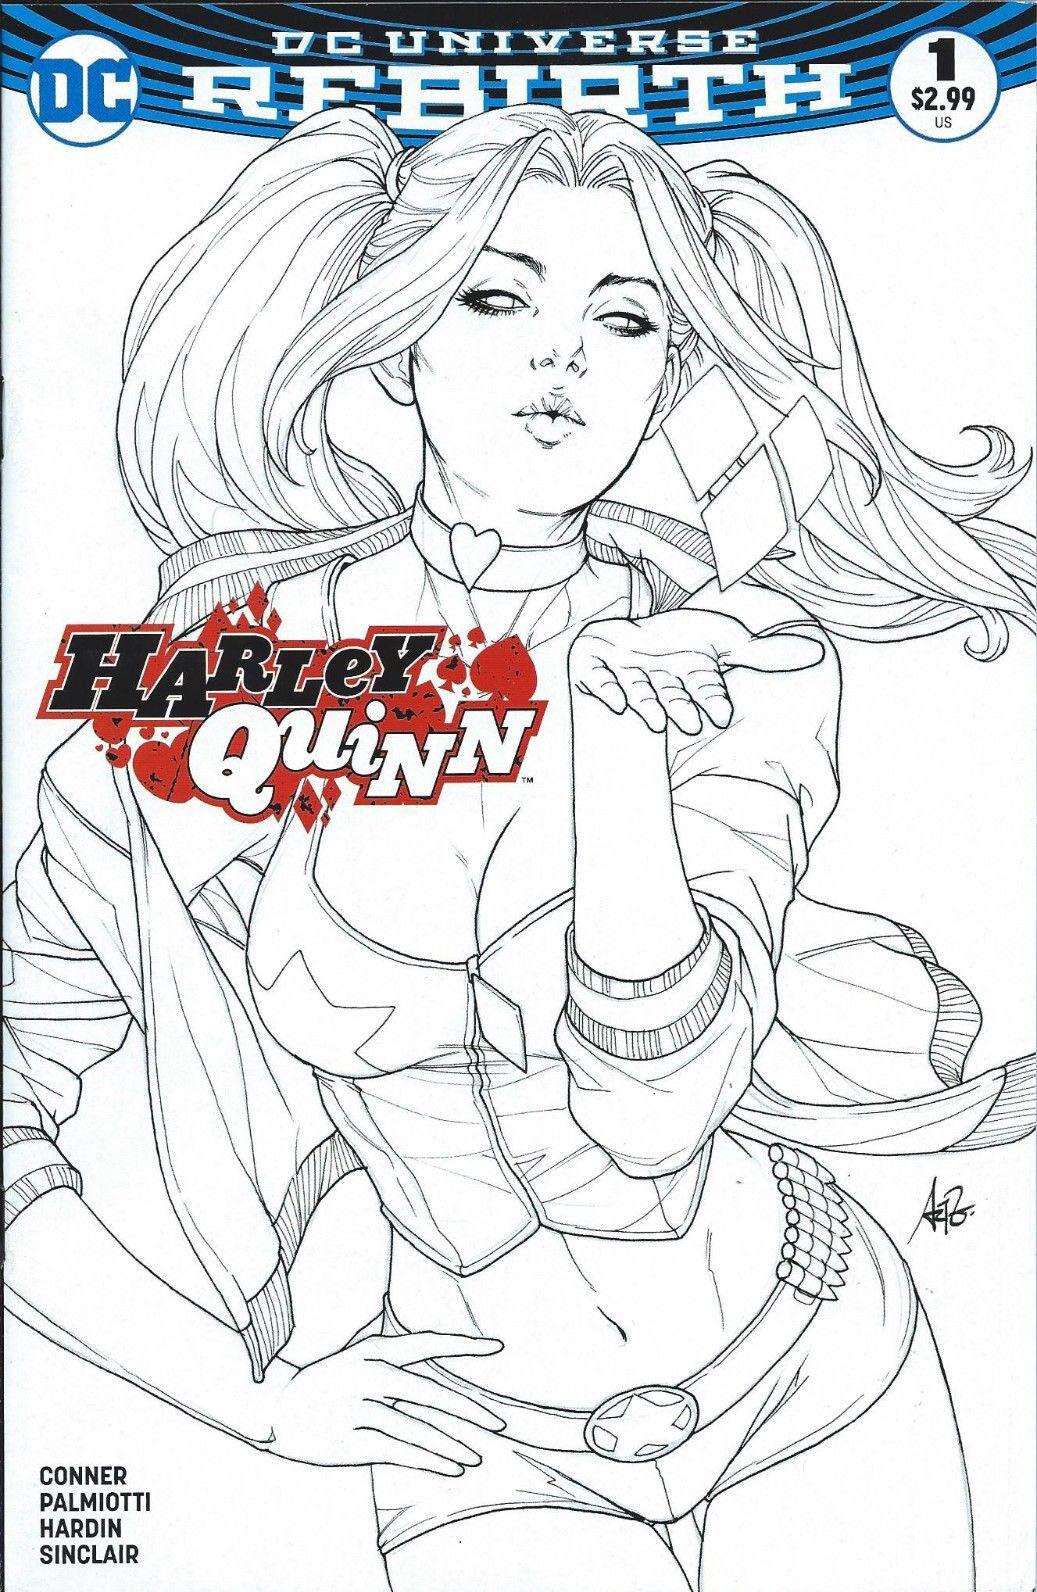 HARLEY QUINN LEGACY EDITION STANLEY ARTGERM LAU LINE ART ART ART COVER DC COMICS 2016 ca3e9f